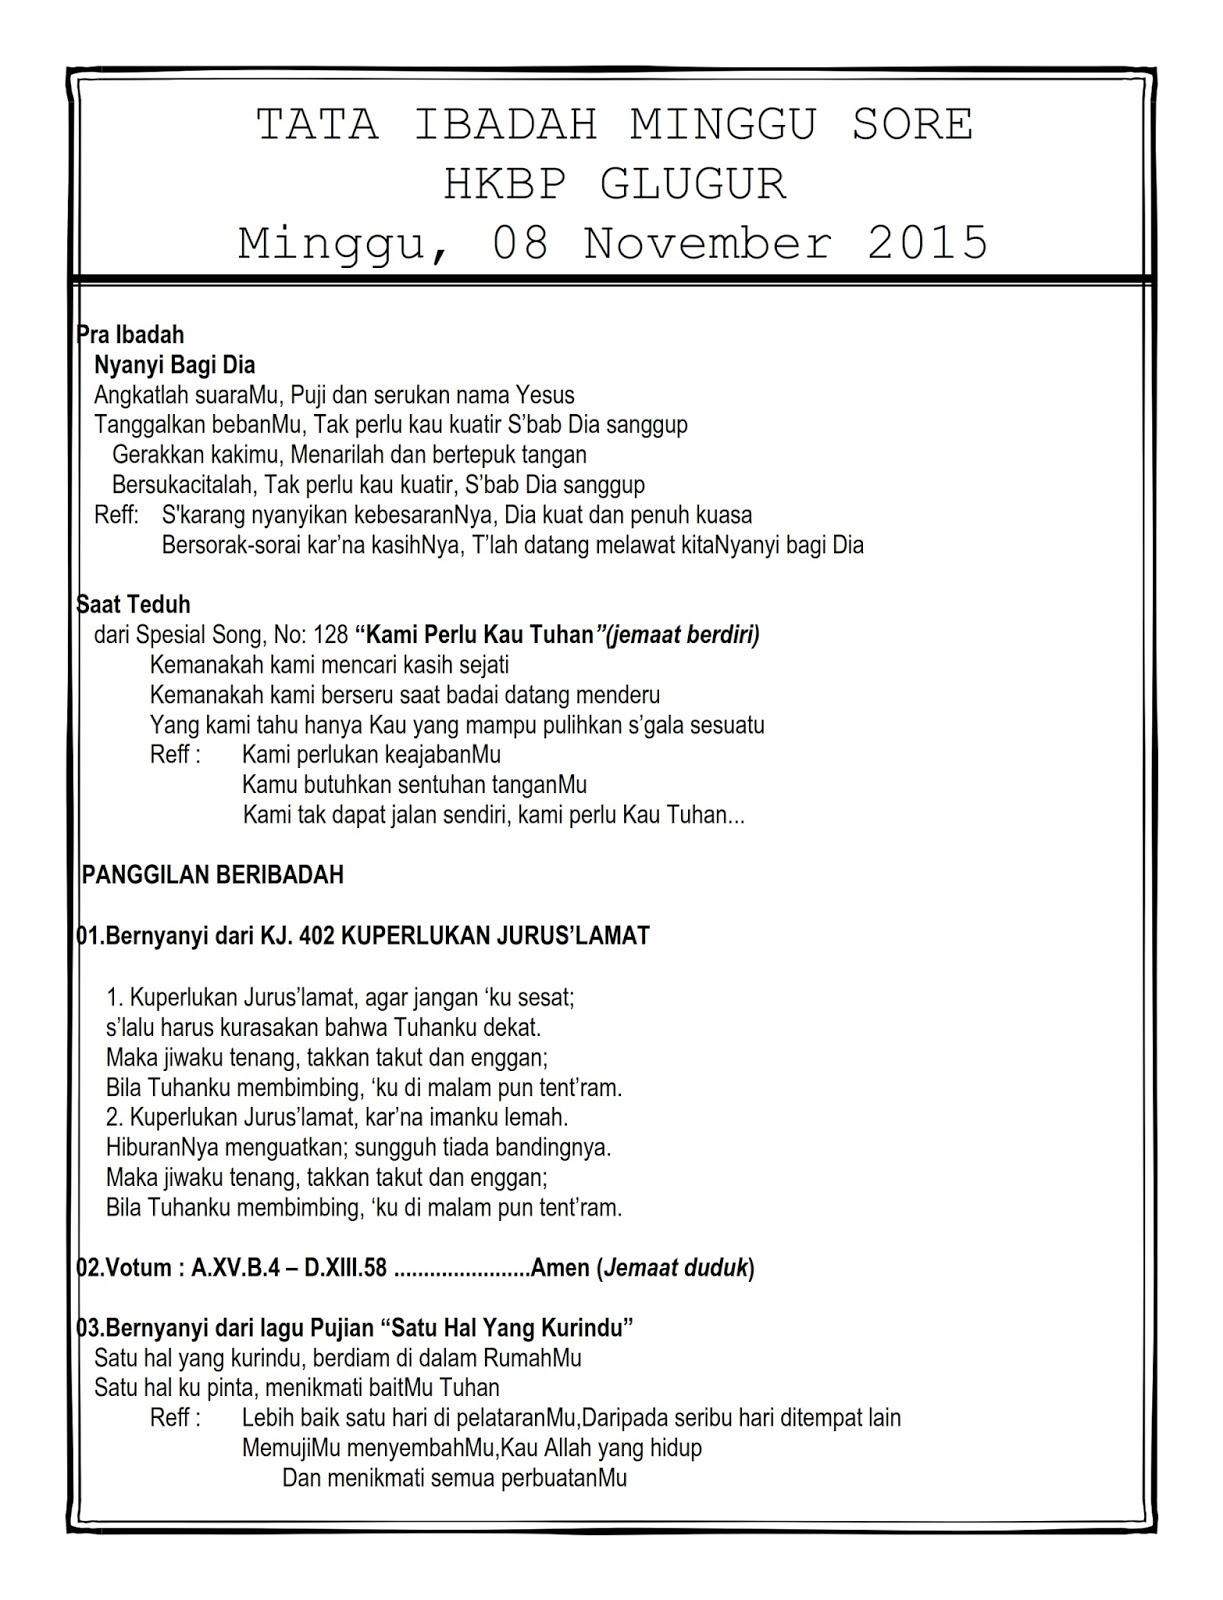 Tata ibadah minggu sore 08 november 2015 hkbp glugur ressort medan